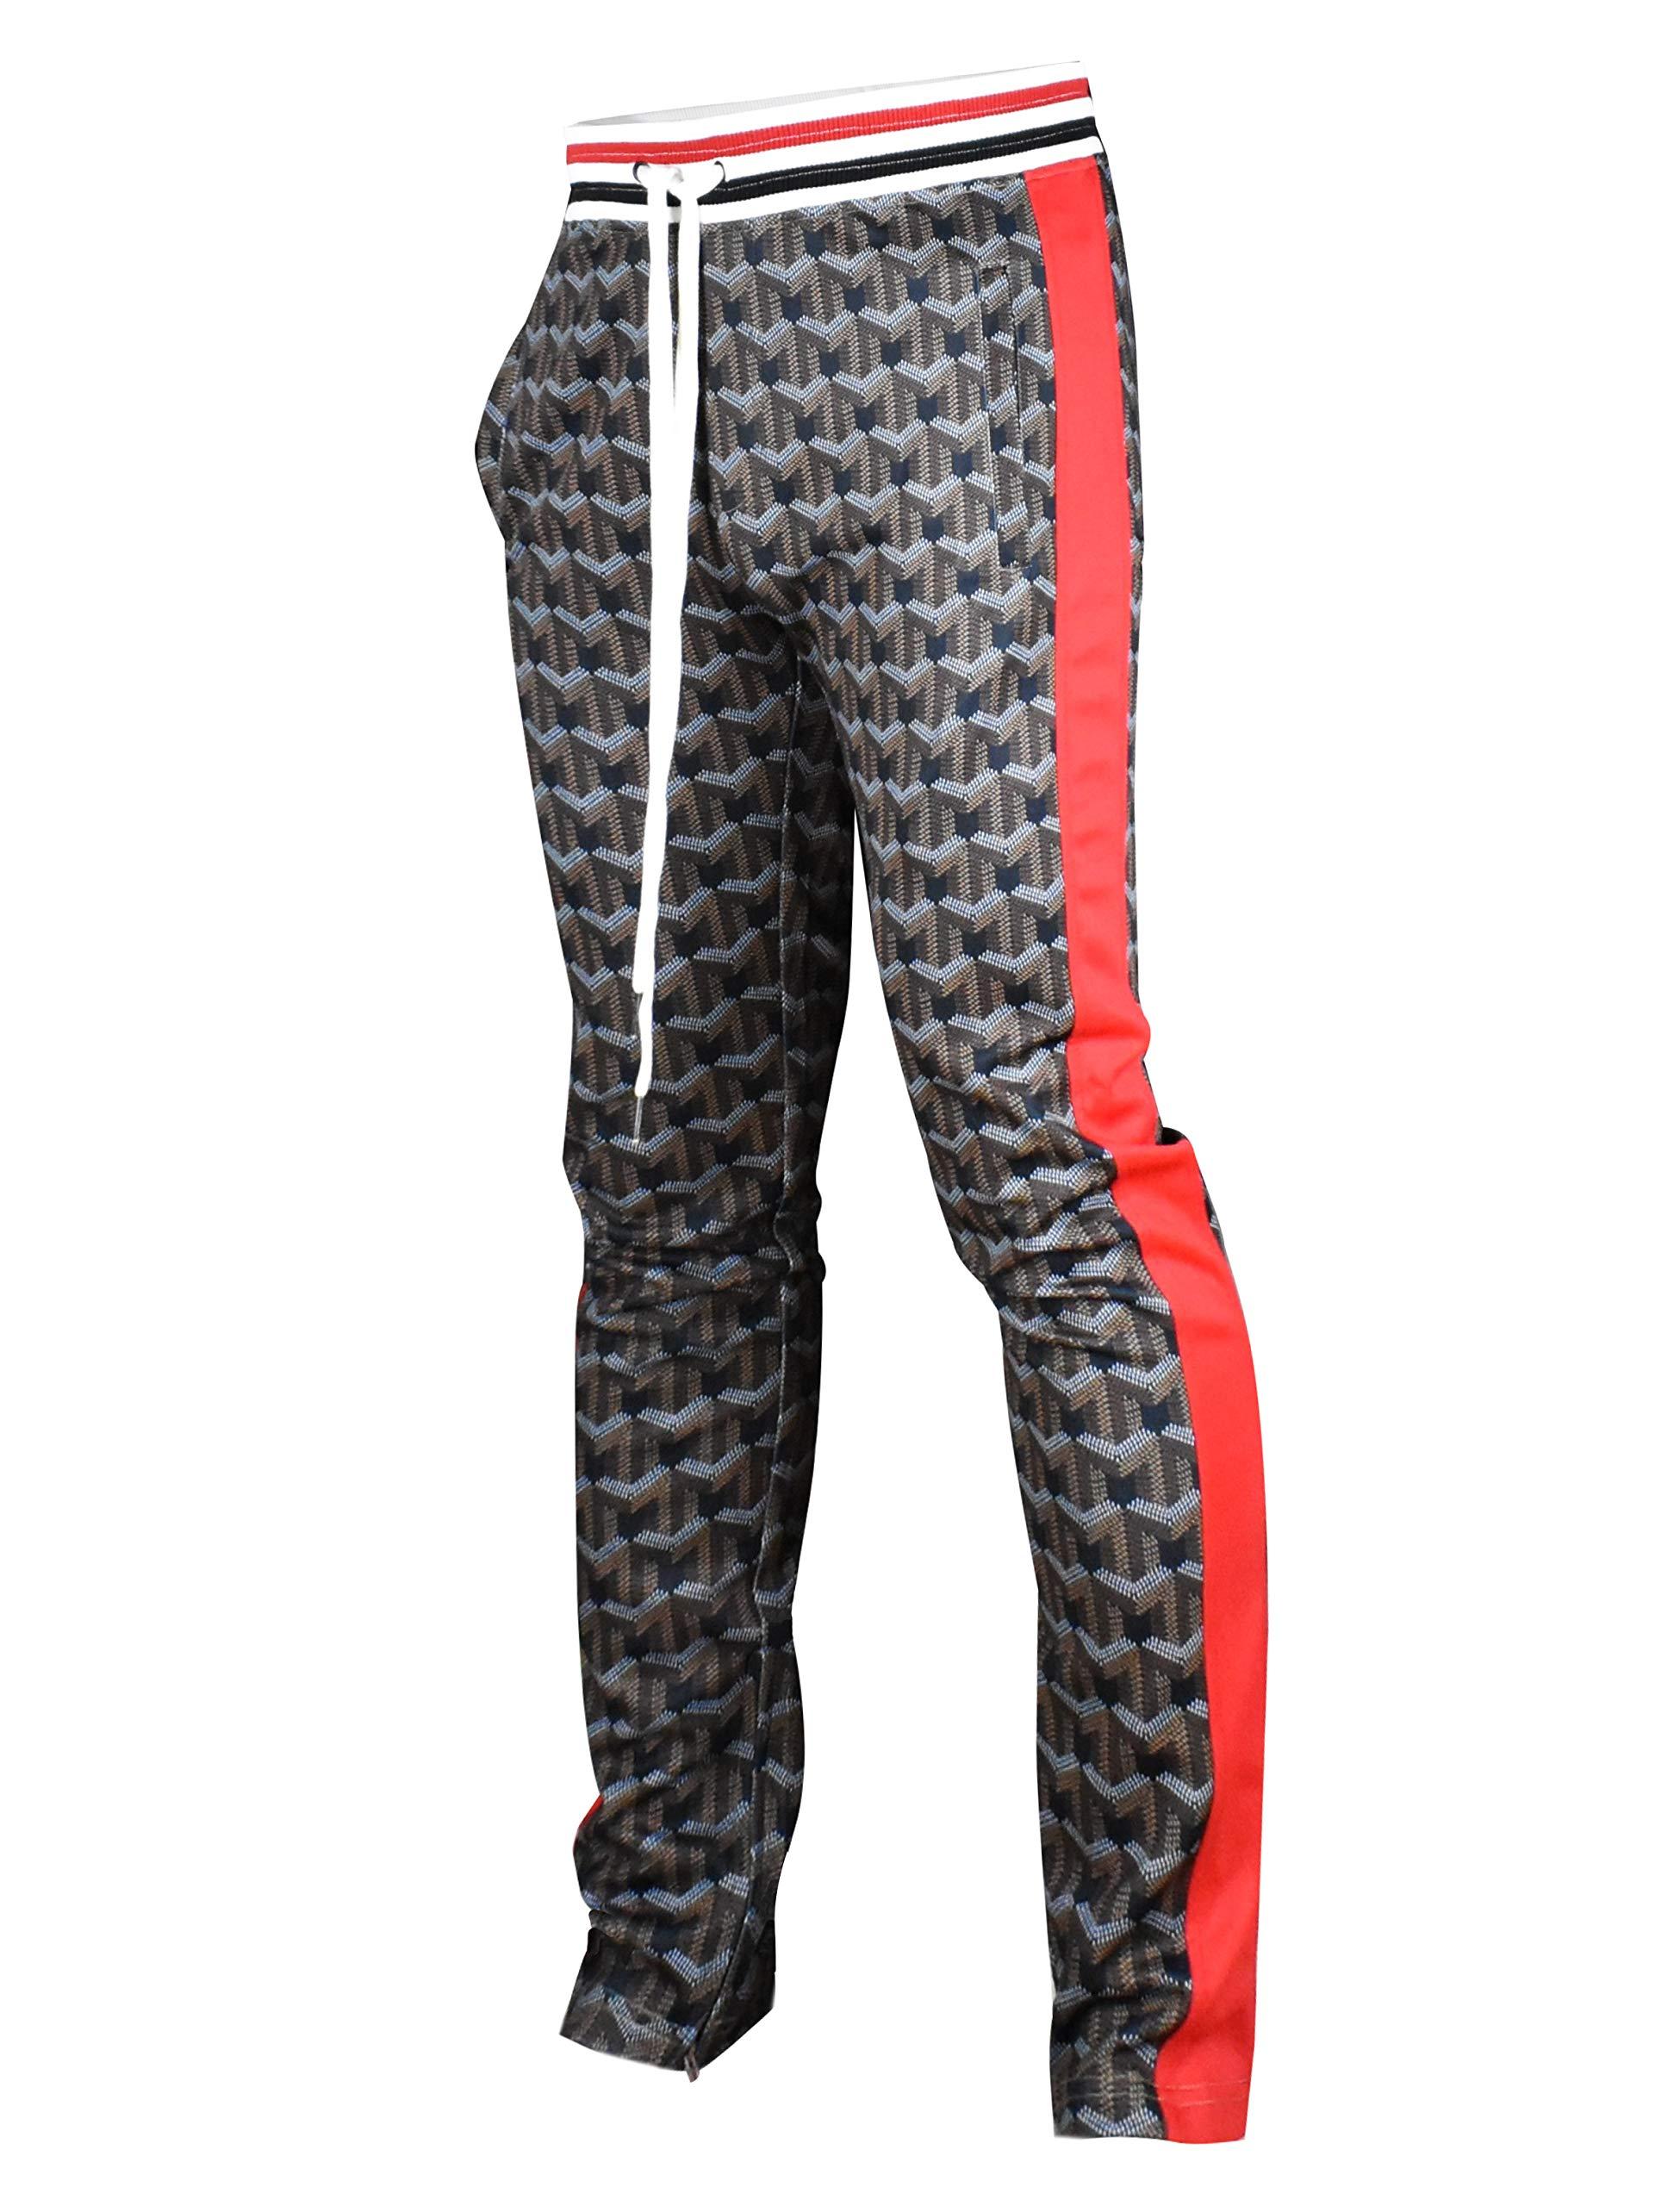 SCREENSHOTBRAND-P11864 Mens Hip Hop Premium Slim Fit Track Pants - Athletic Jogger Pattern Print Taping Bottoms-Black-Small